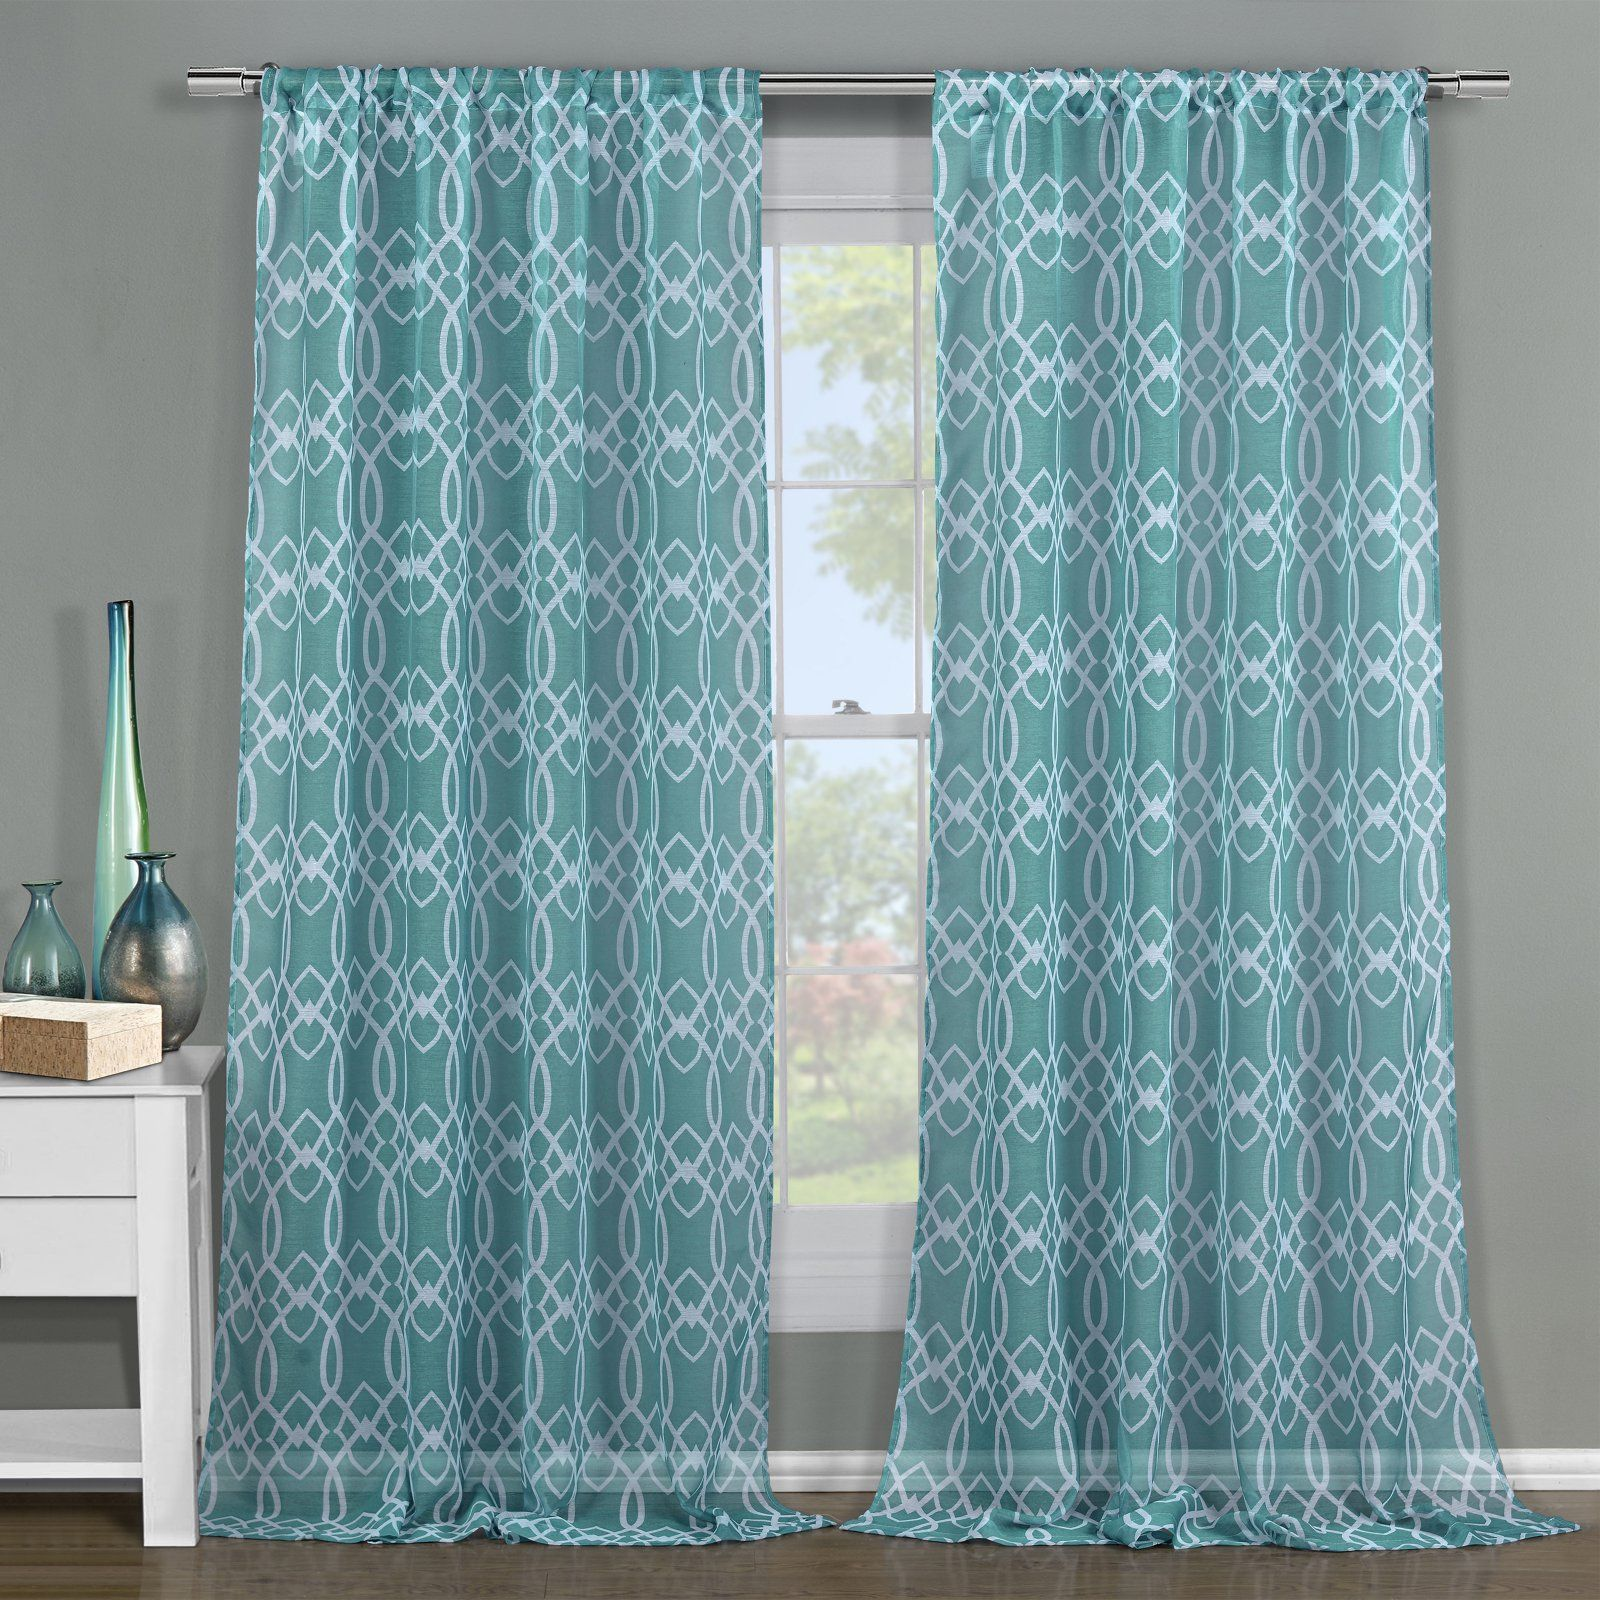 Duck River Newbella Pole Top Curtain Panel Pair Teal Geometric